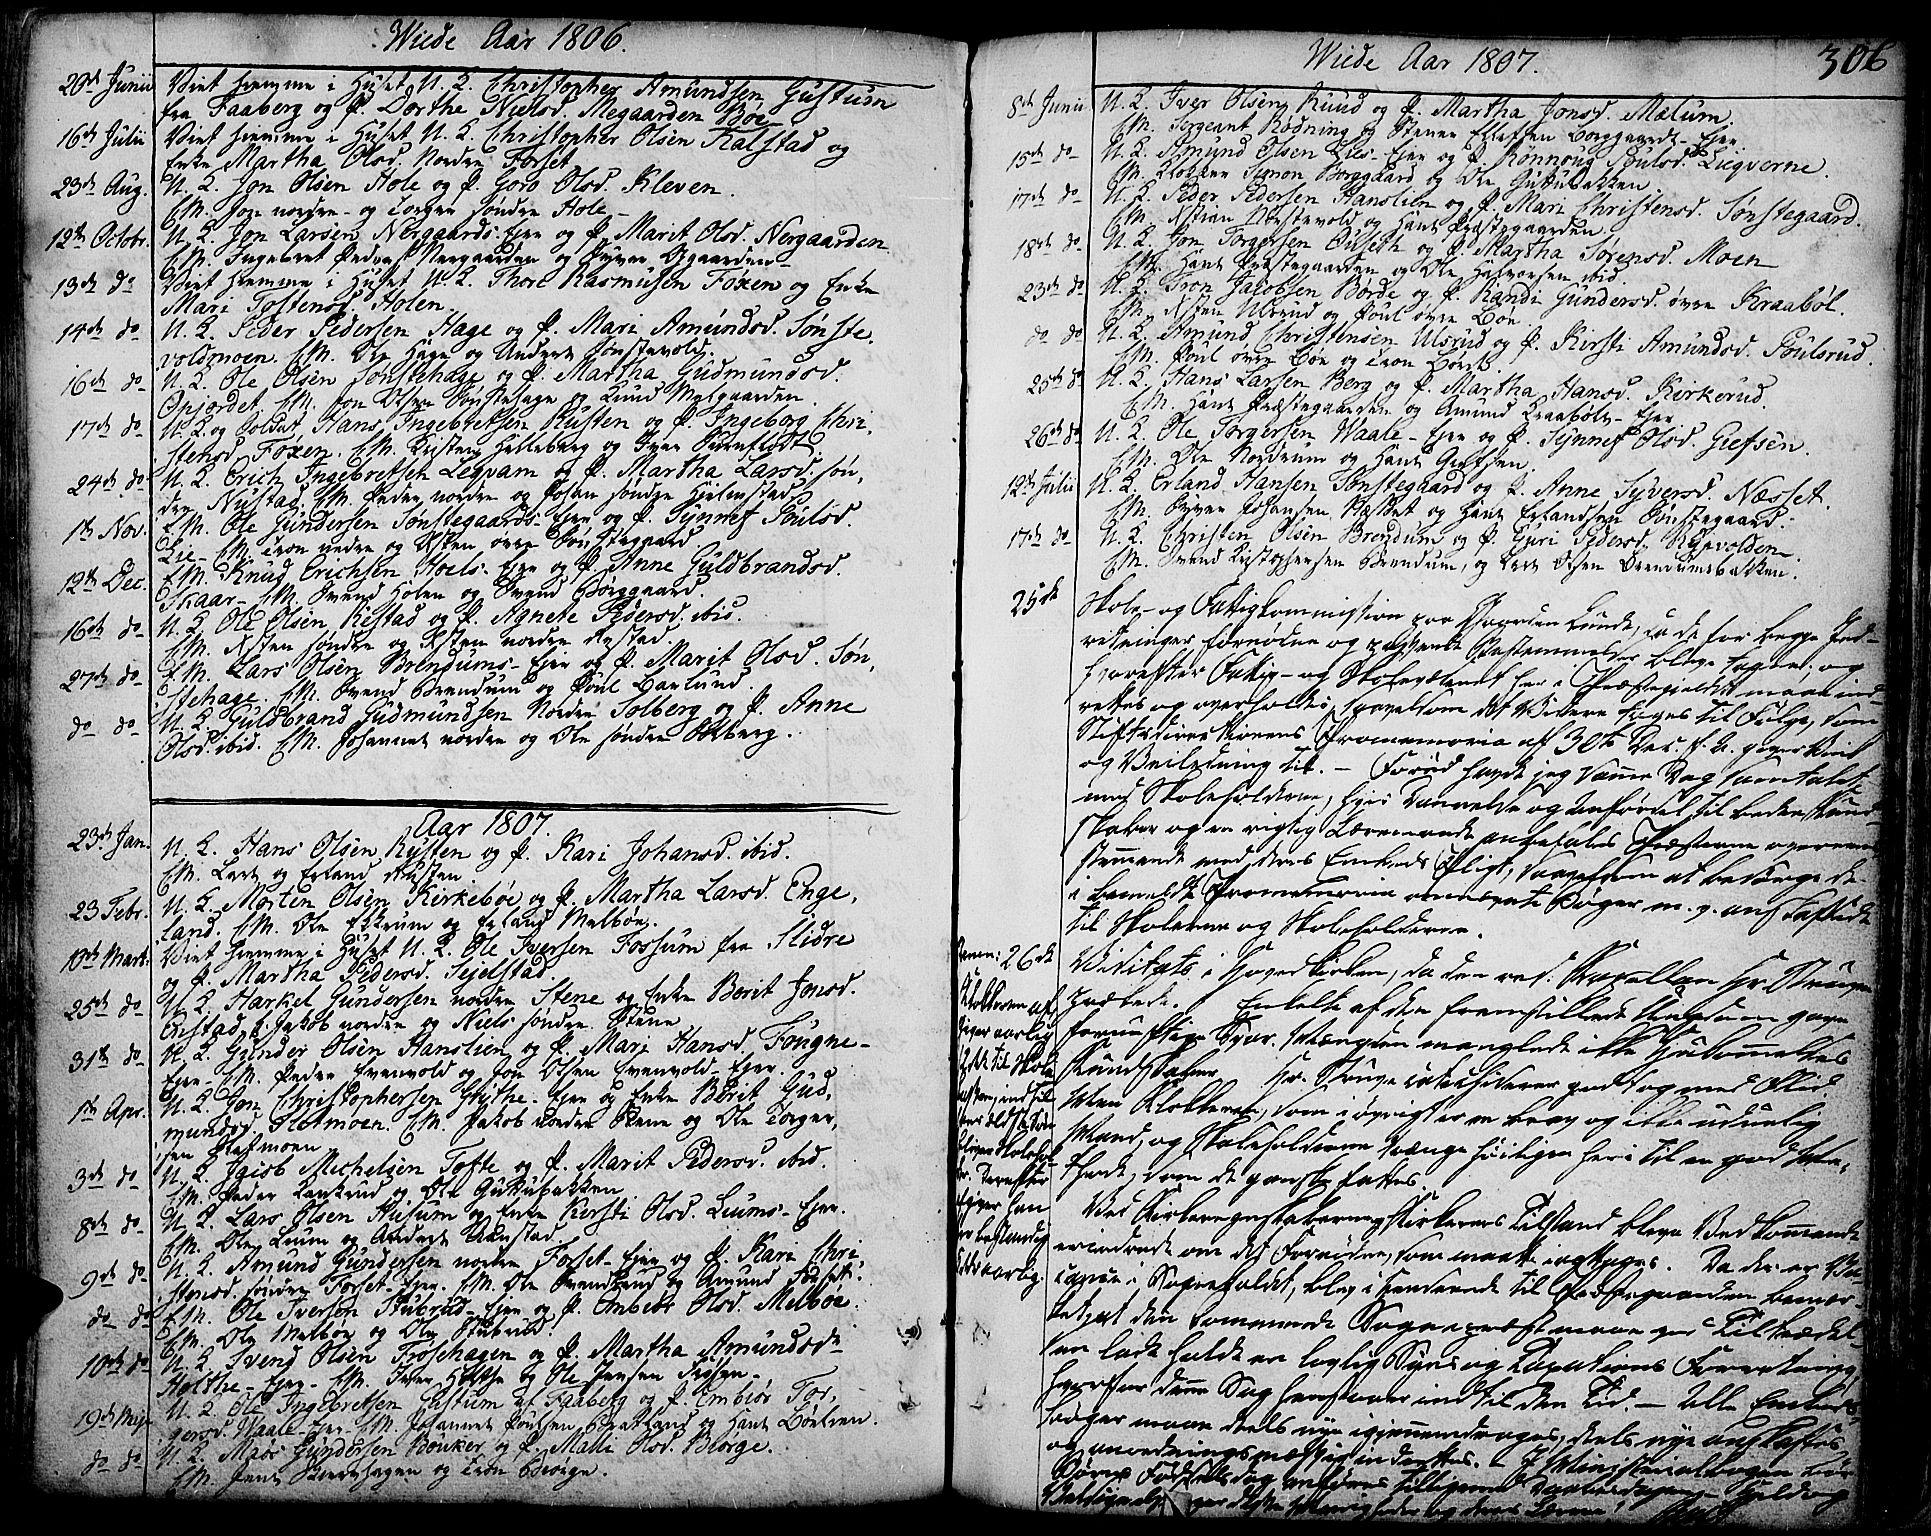 SAH, Gausdal prestekontor, Ministerialbok nr. 3, 1758-1809, s. 306